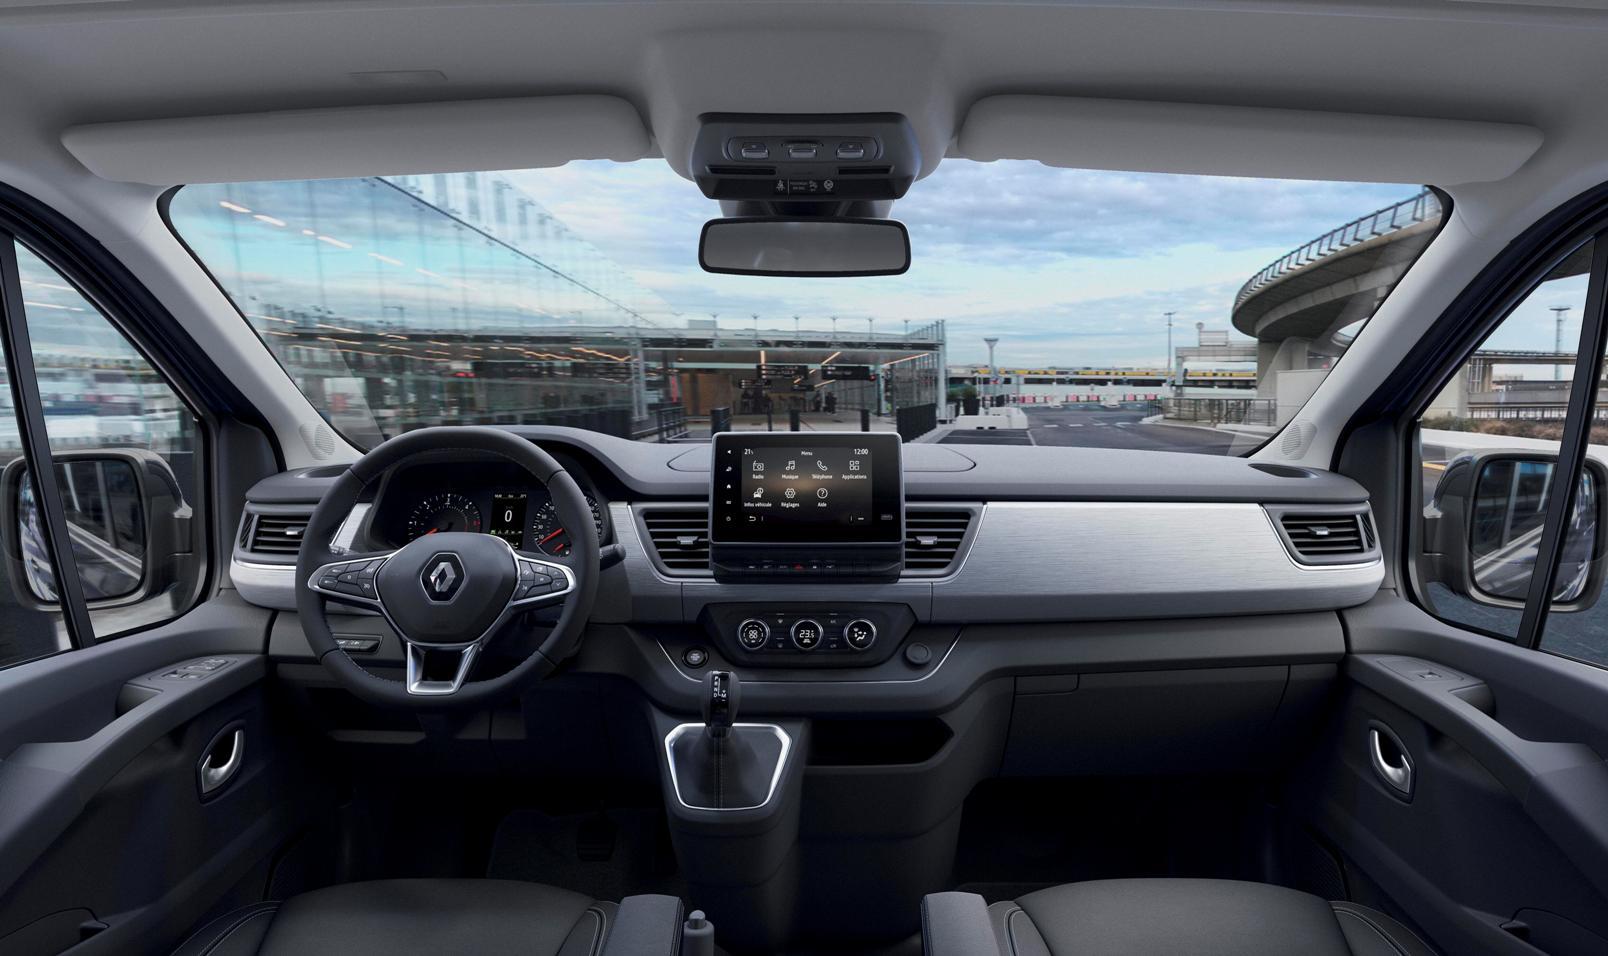 Renault Trafic Combi Spaceclass 2021 (5)